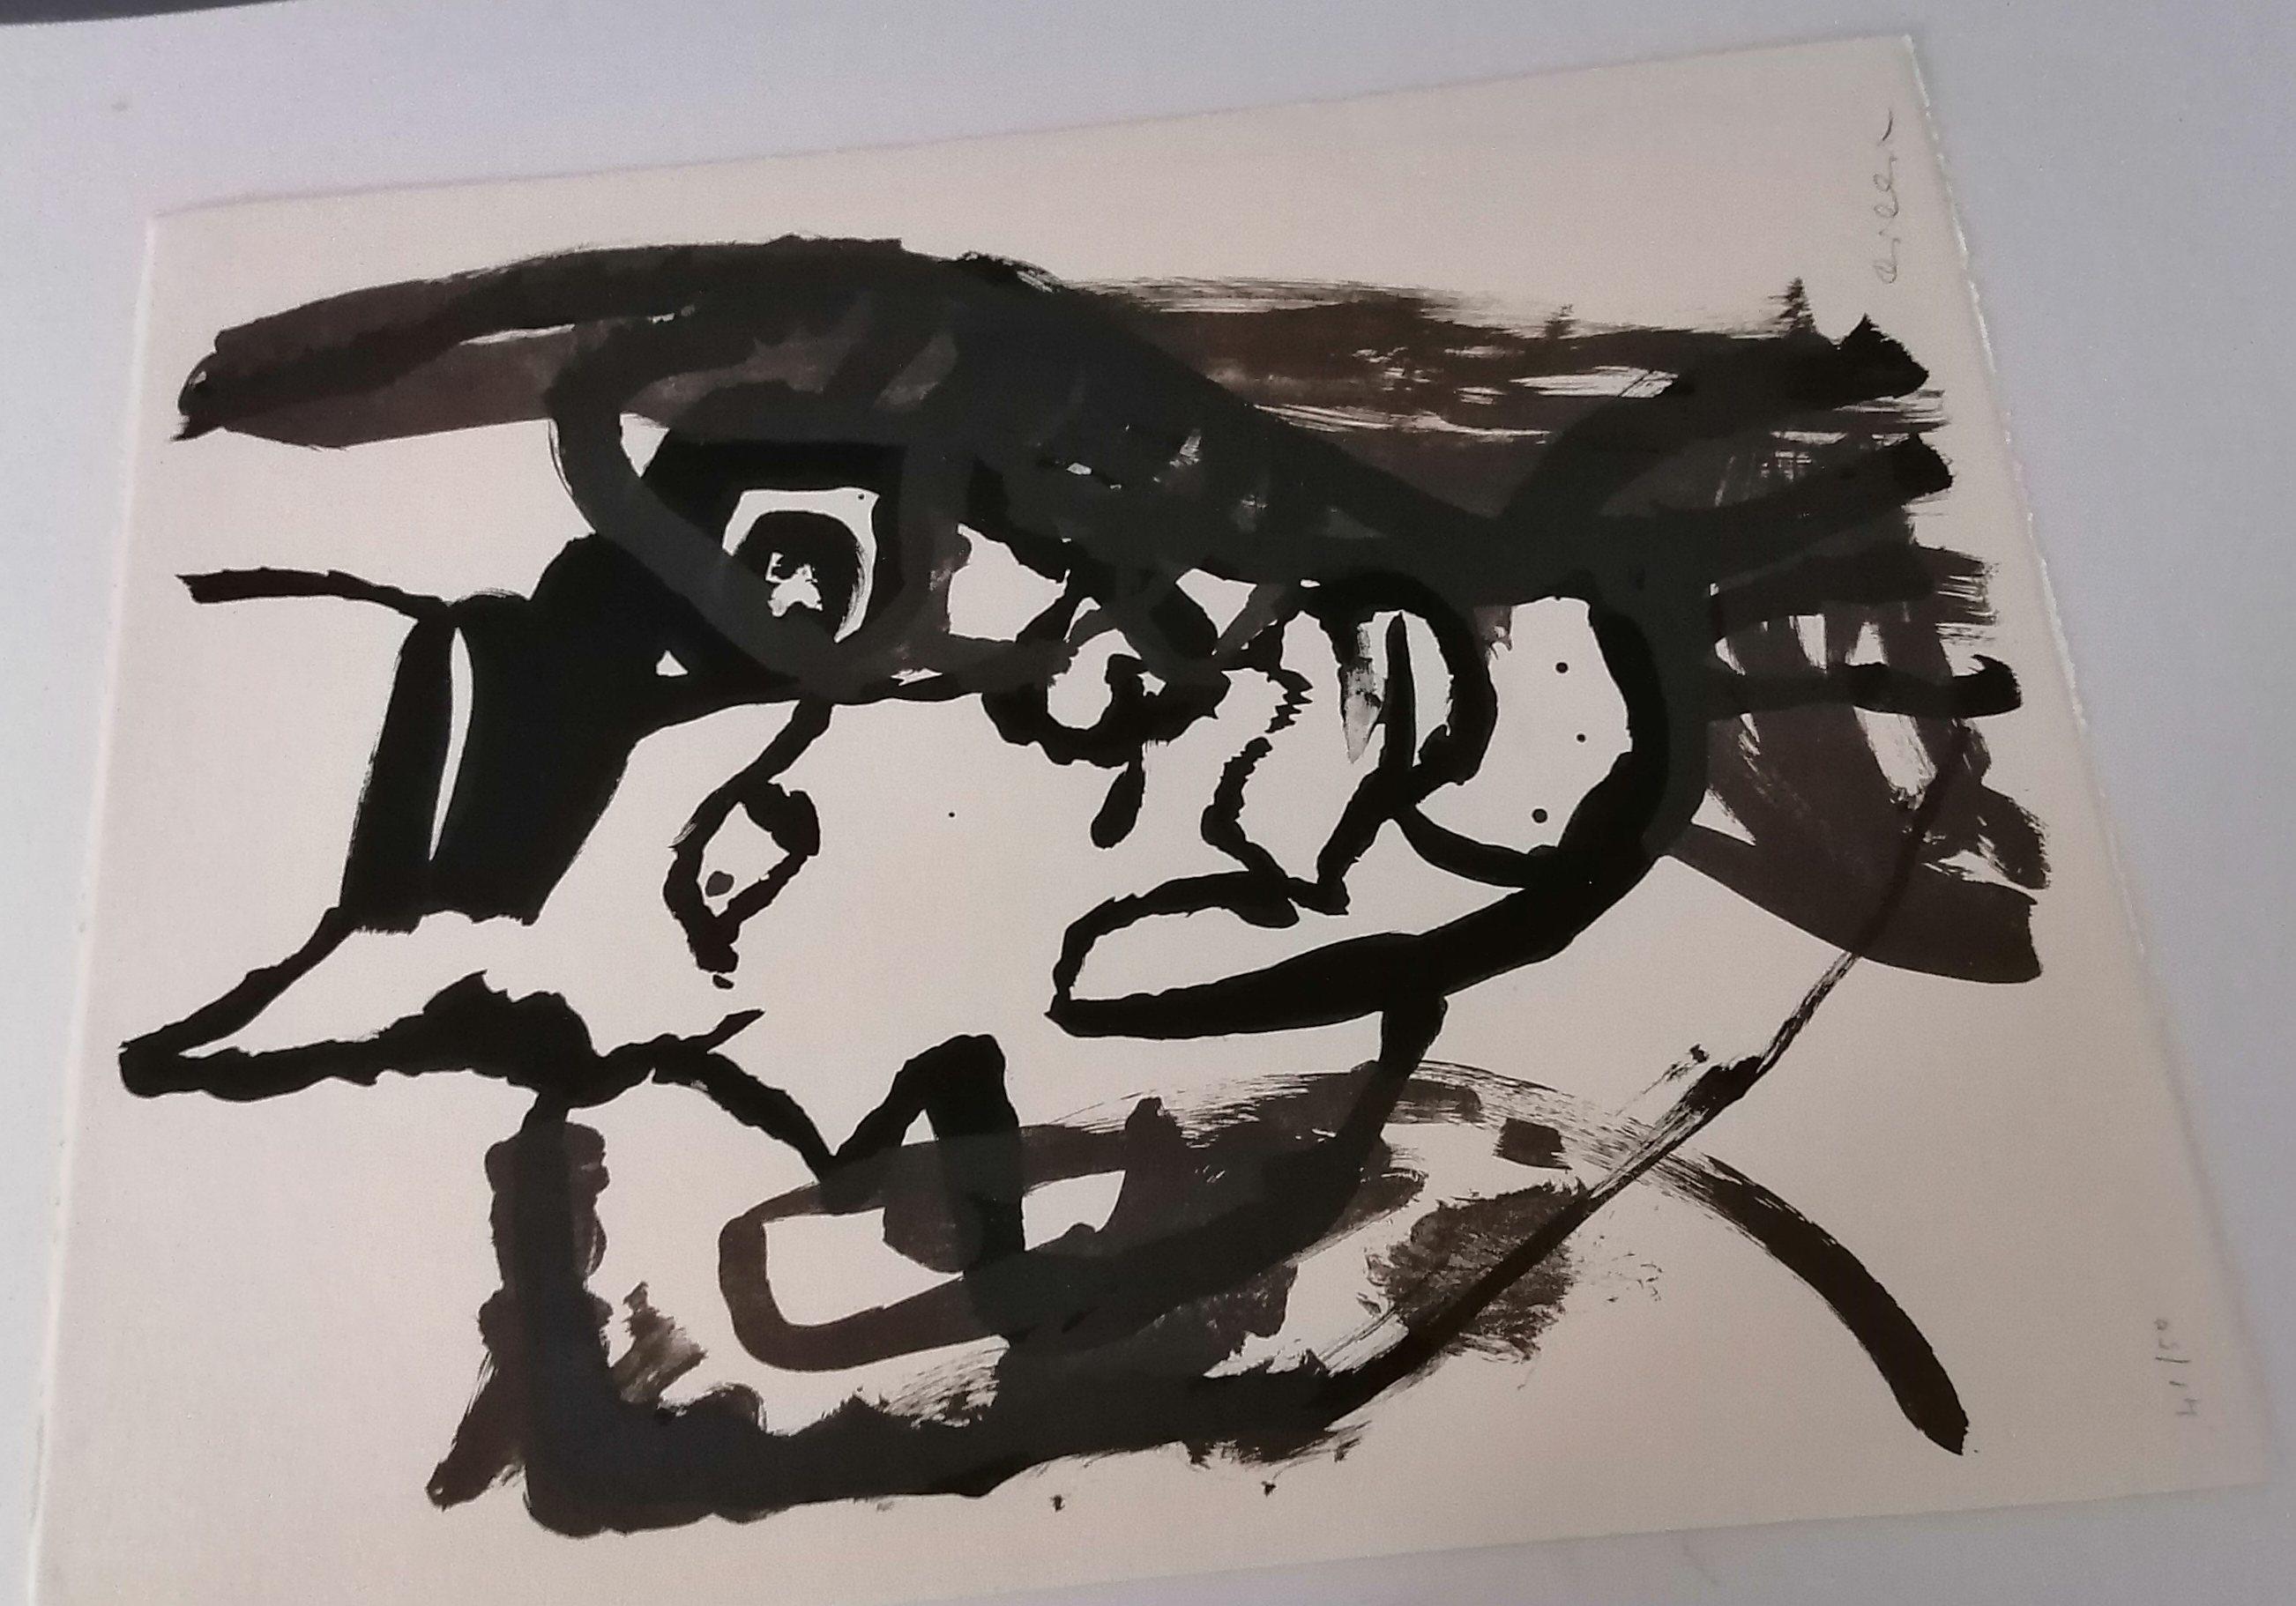 https://www.norstamps.com/content/images/stamps/gtgallerier/176.jpg